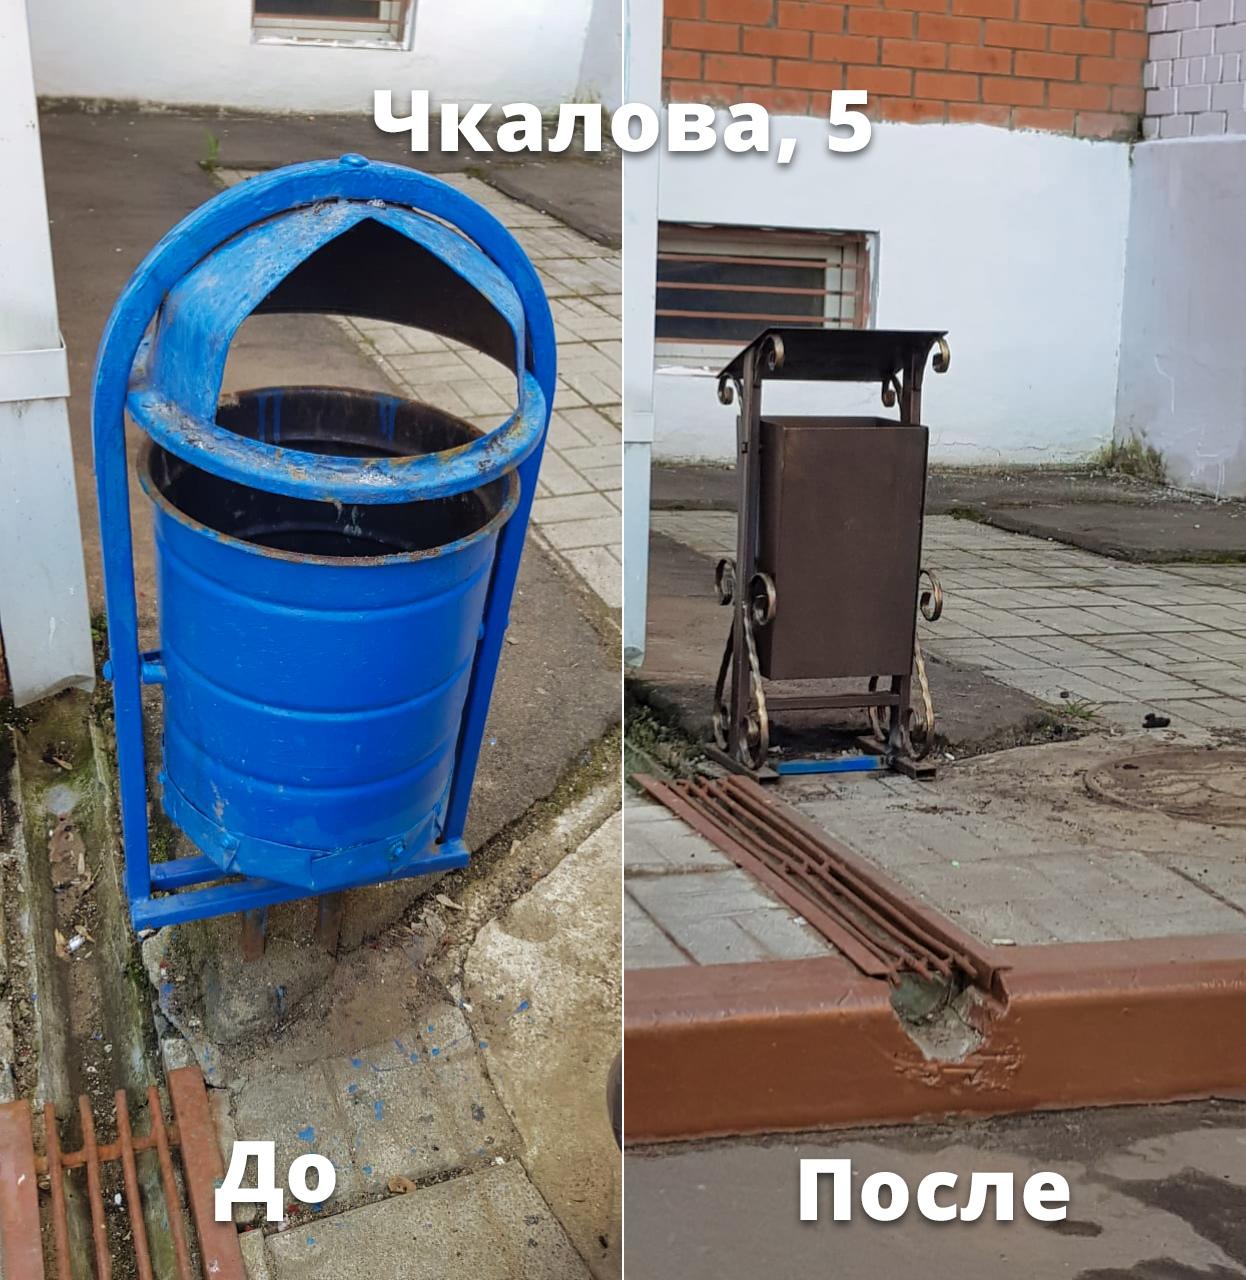 Установили новую урну на Чкалова, 5